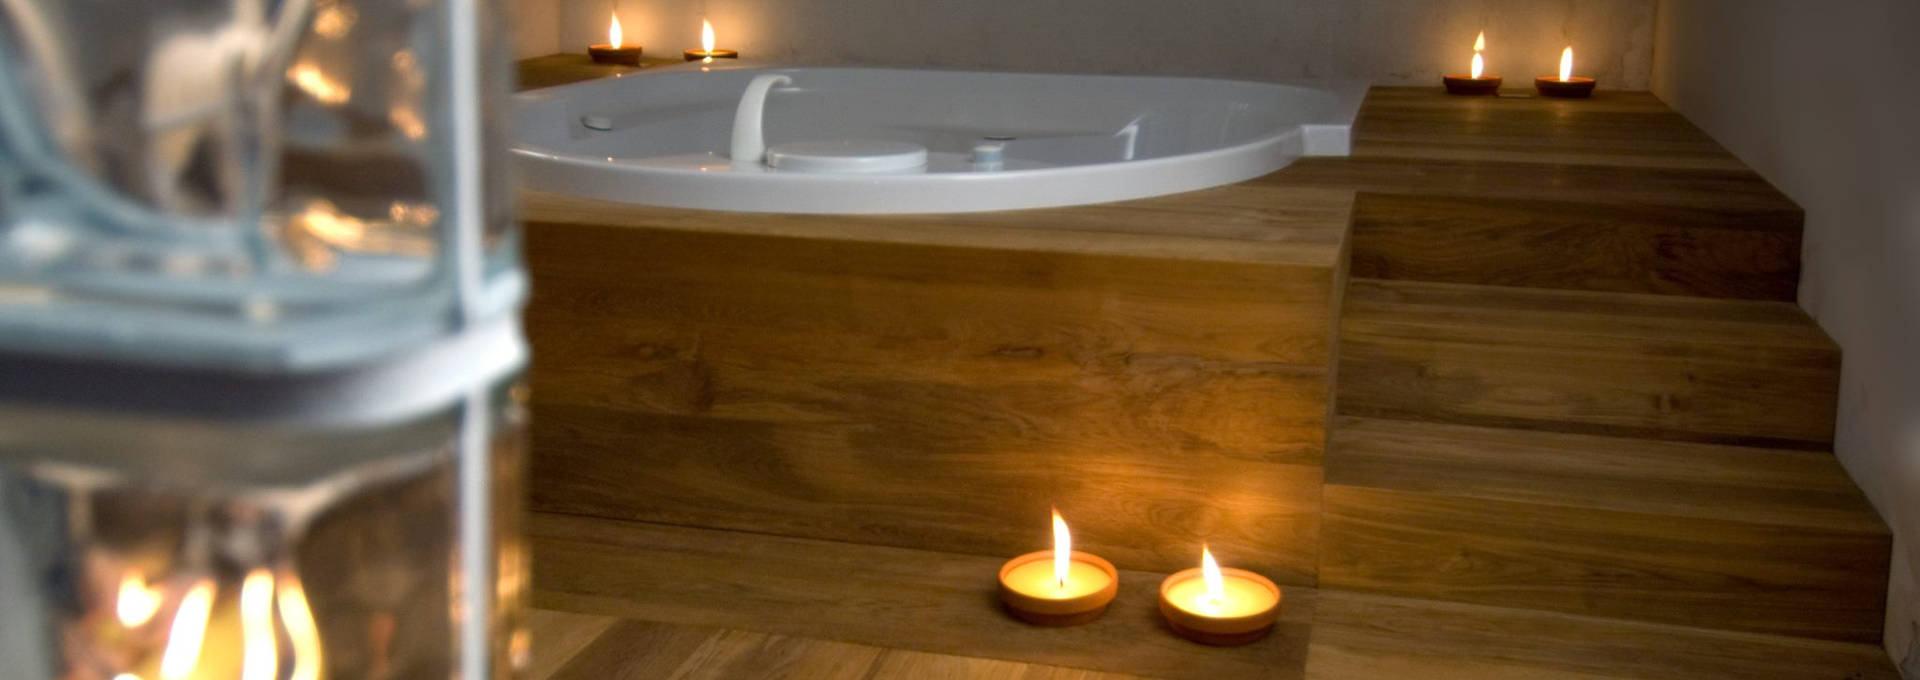 Zona-relax-realizzata-in-teak-Atelier-Tonini